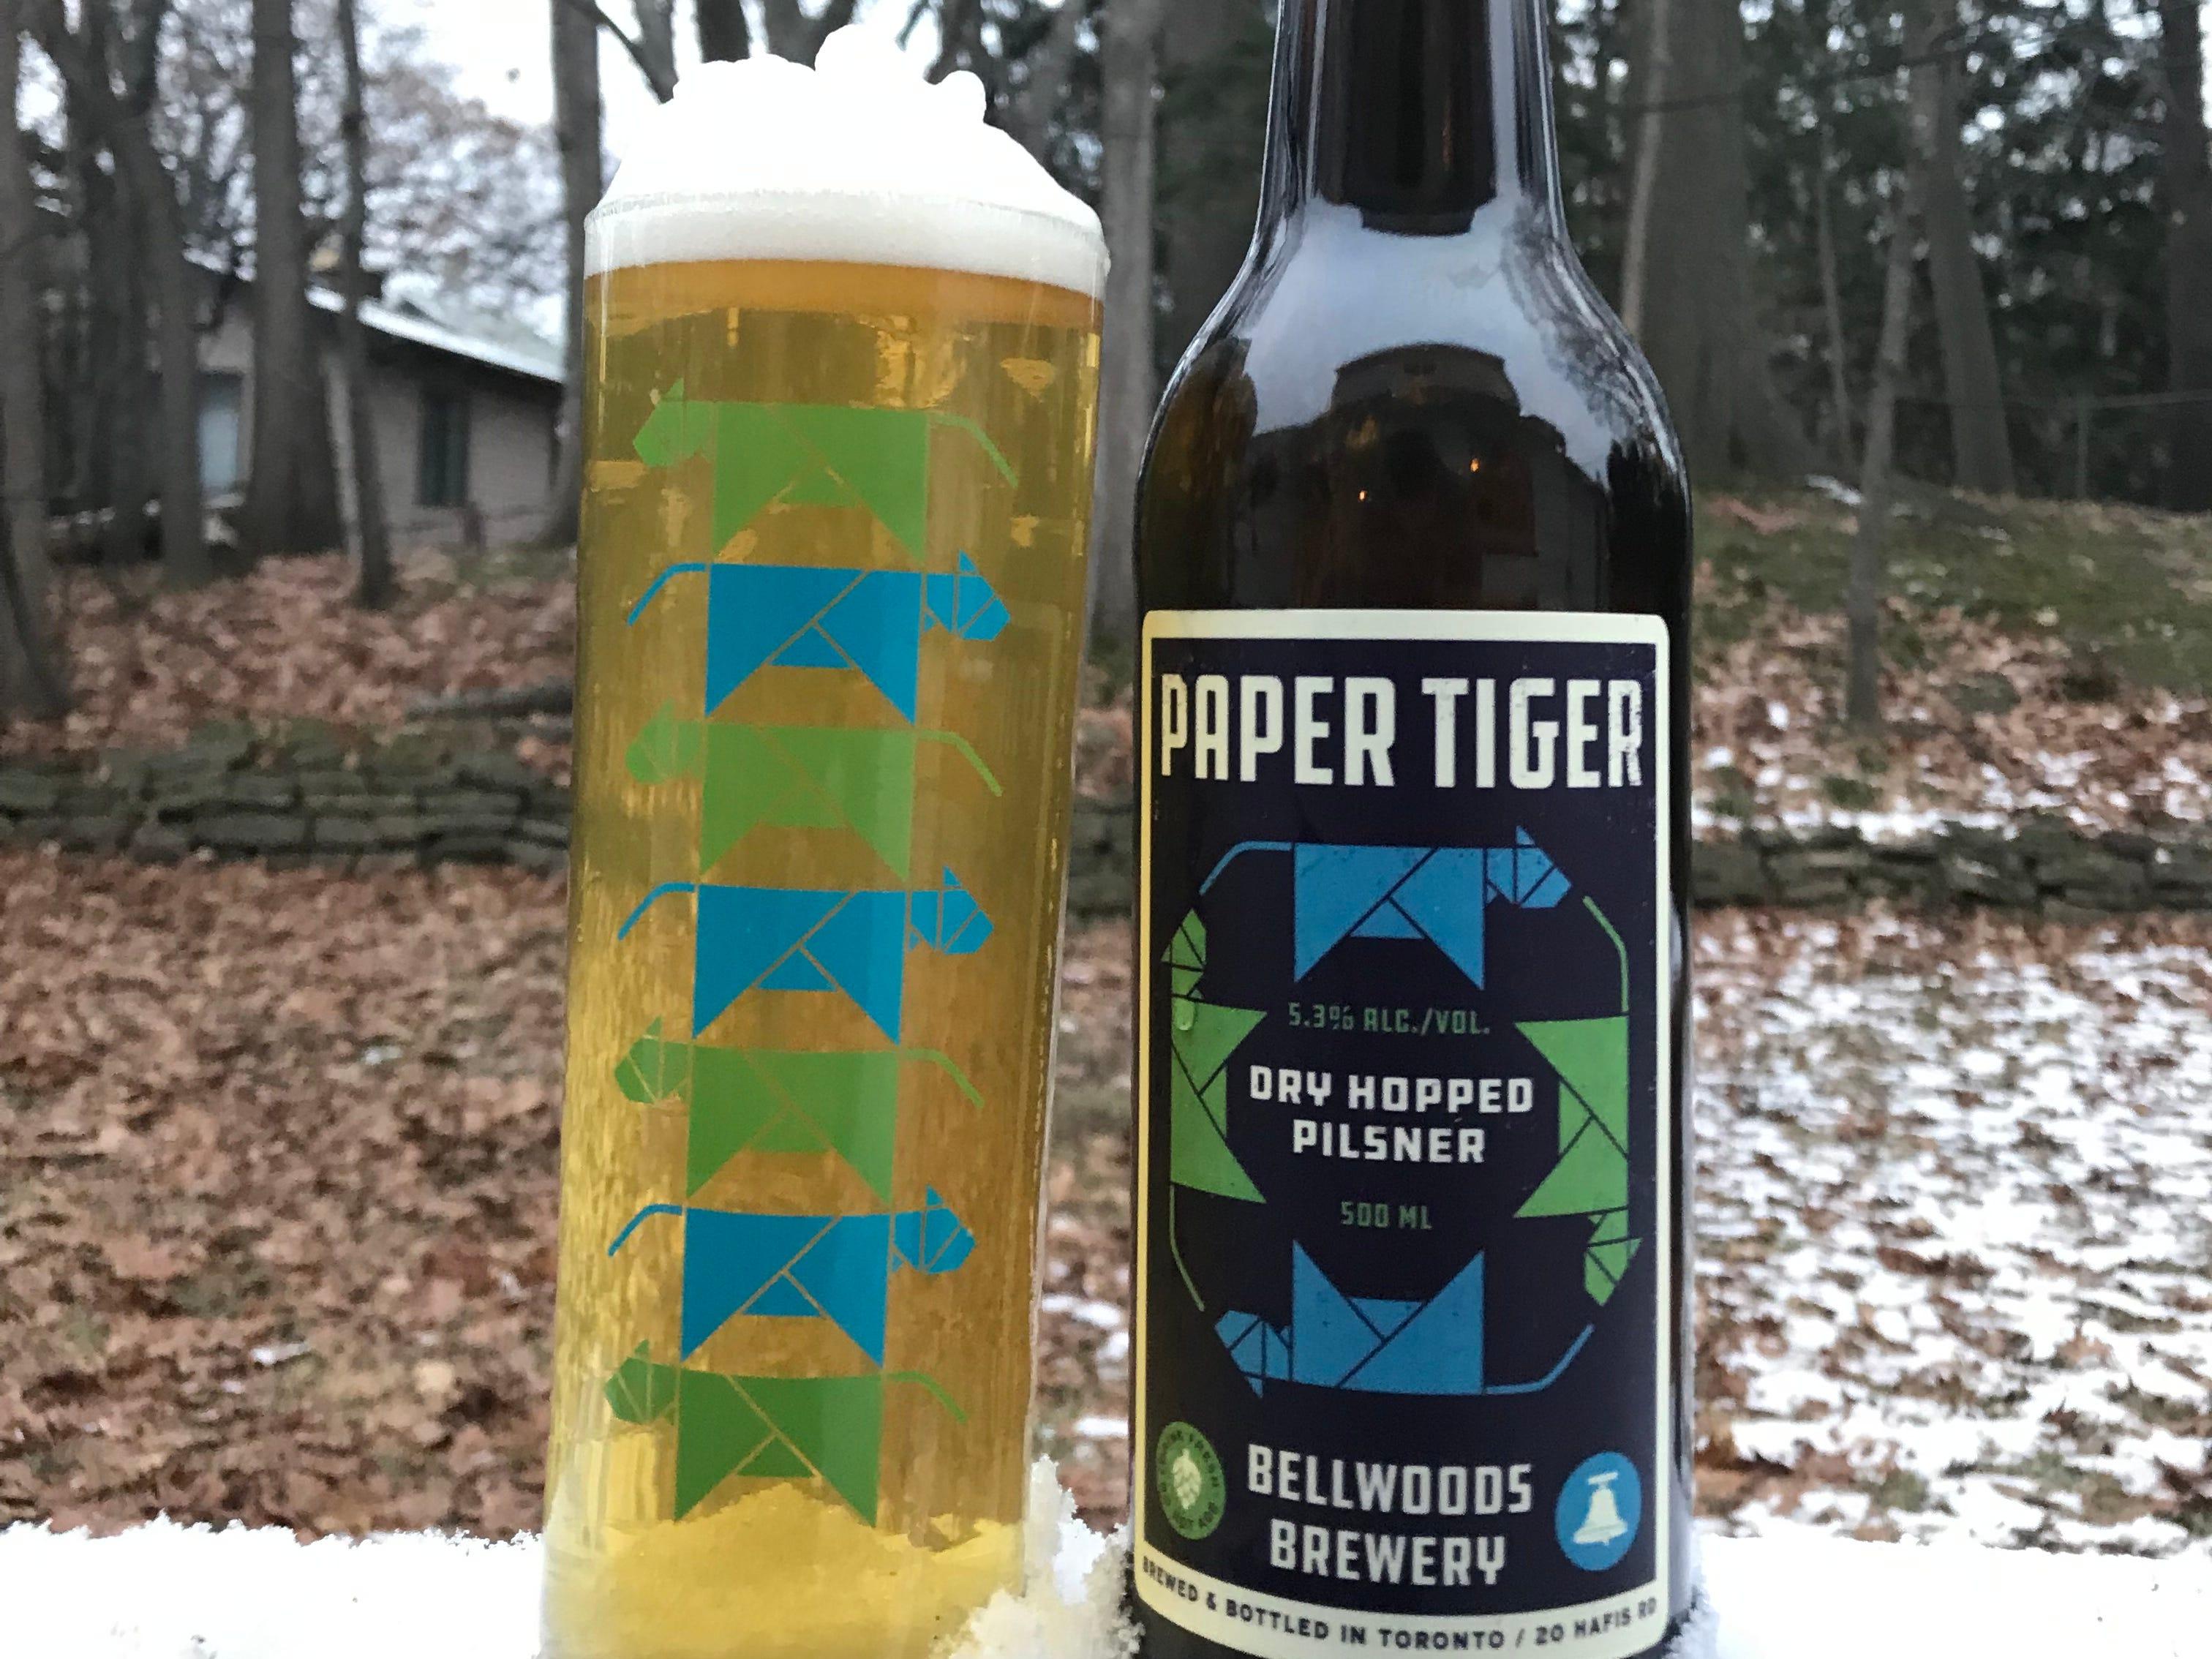 Bellwoods Brewing Paper Tiger, dry-hopped Pilsner.